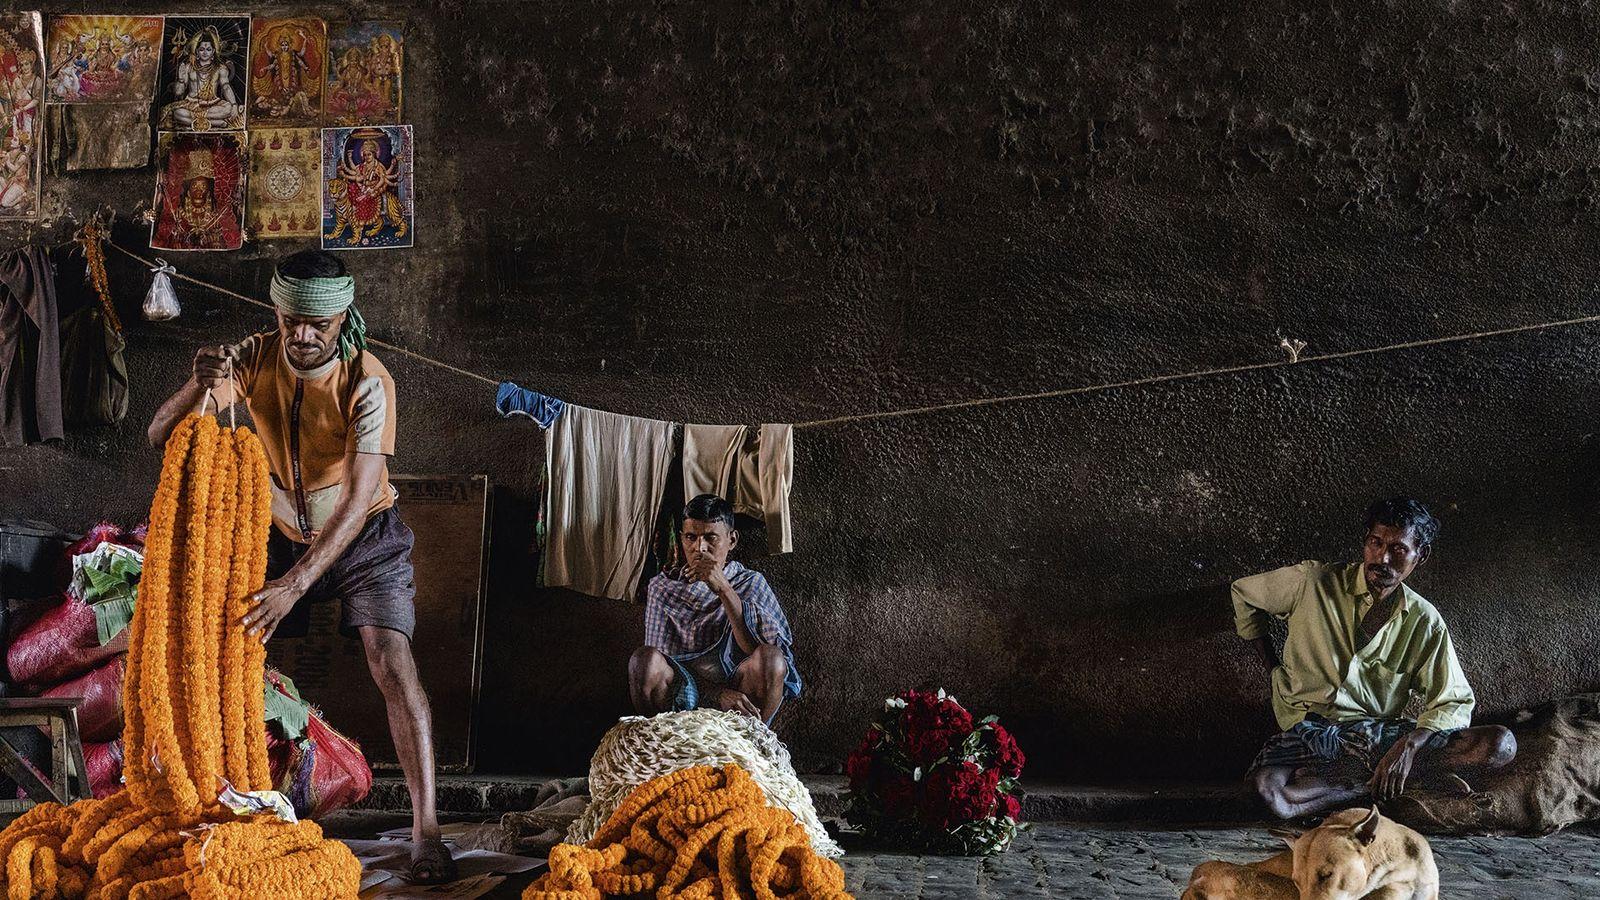 Workers at Kolkata Flower Market